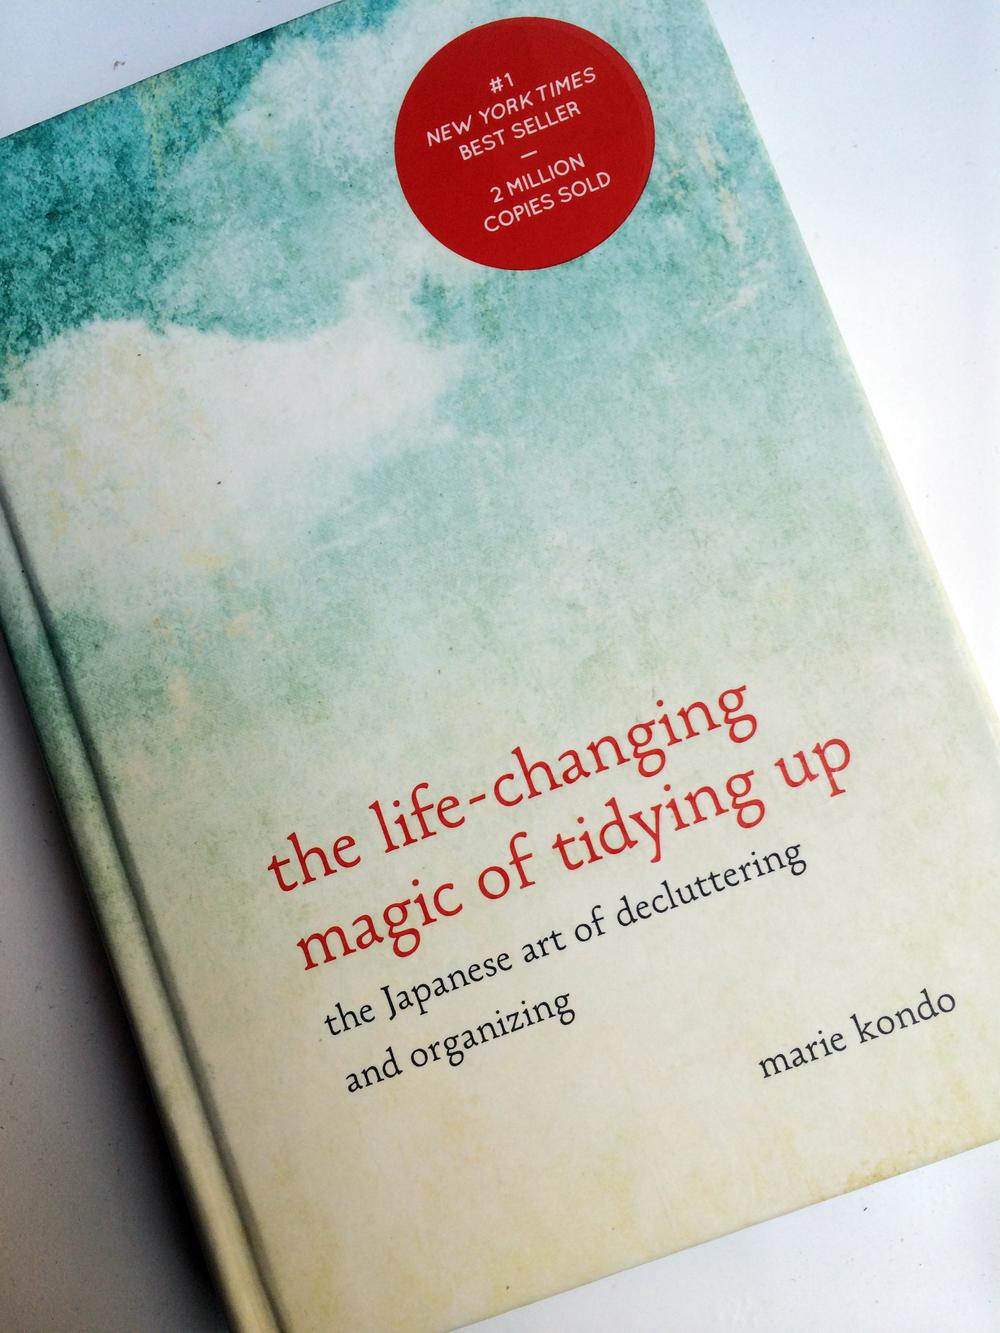 Marie Kondo NY Times Best Seller